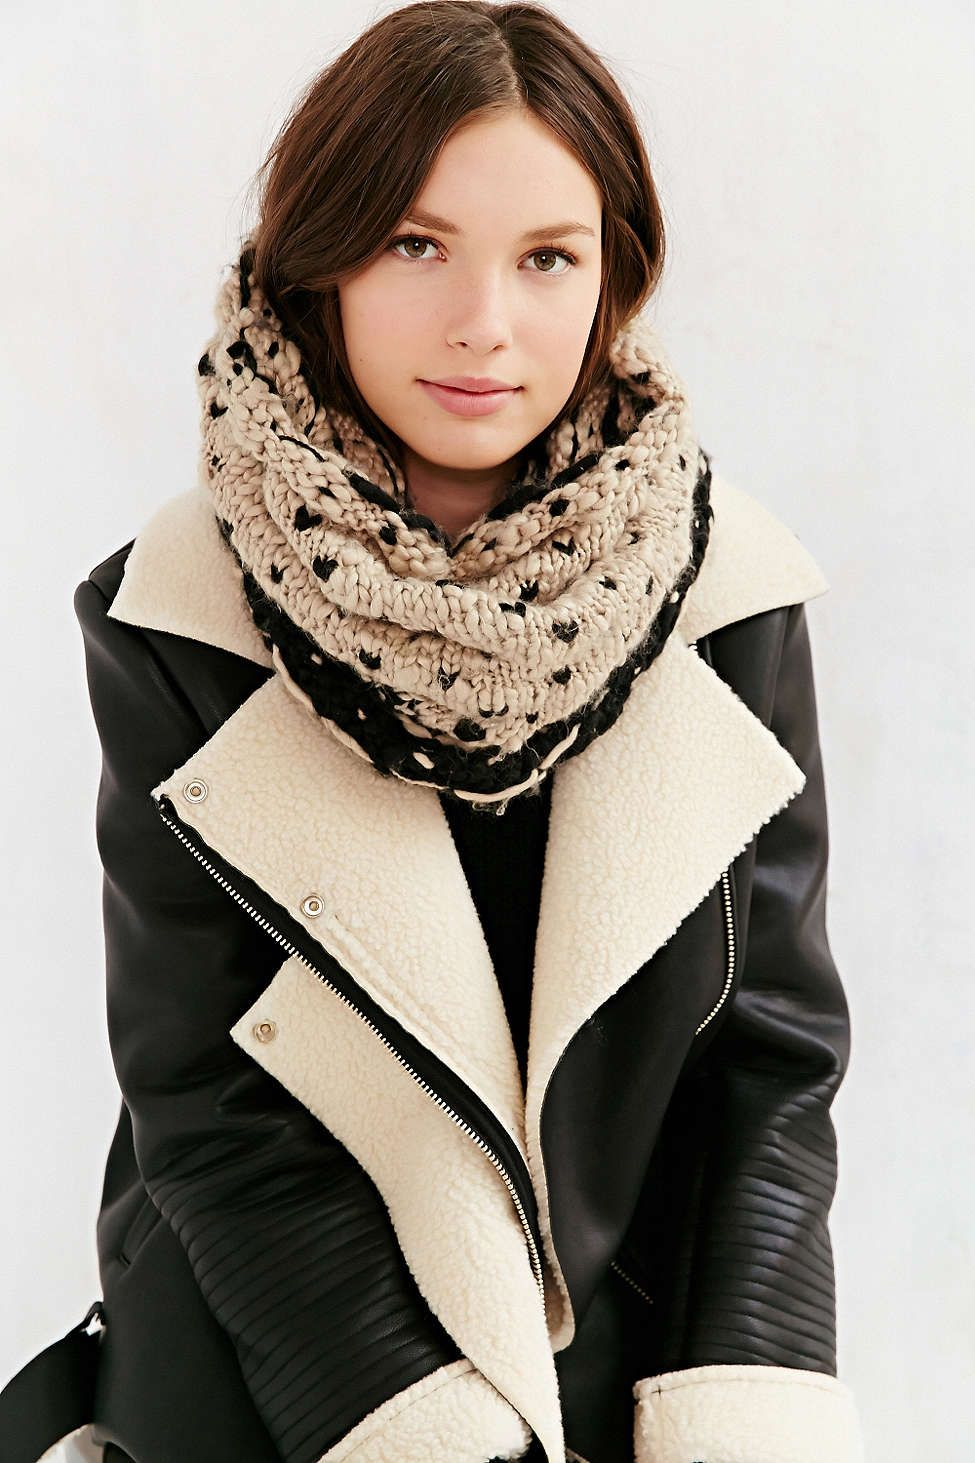 Bickley + Mitchell Mix Knit Snood Scarf | Snood scarf ...